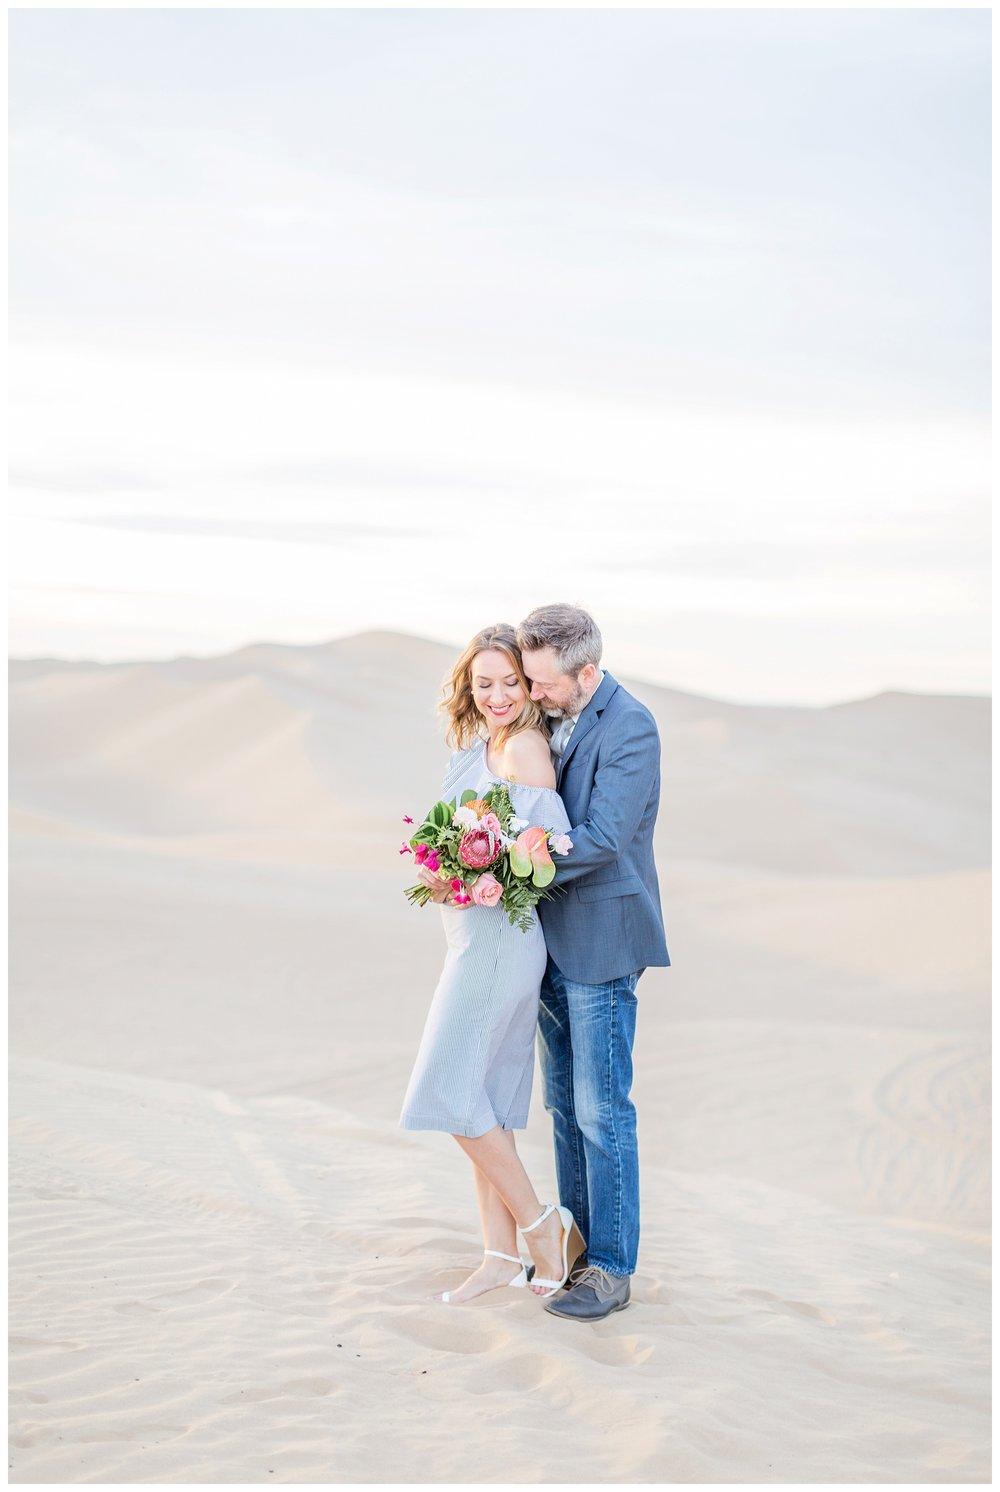 Glamis Sand Dunes Engagement_0001.jpg